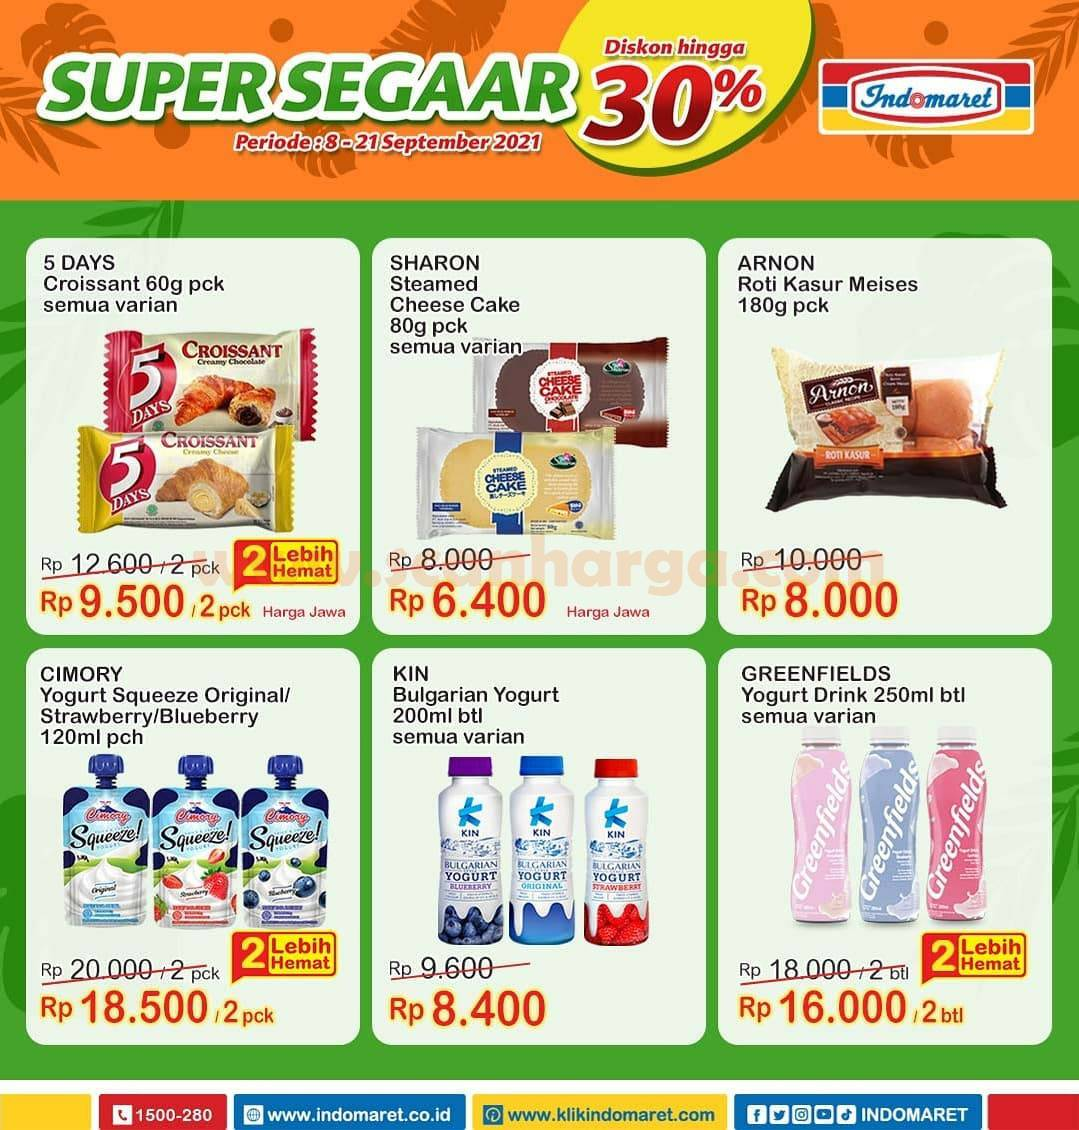 Promo INDOMARET Produk SUPER SEGAAR Periode 8 - 21 September 2021 1